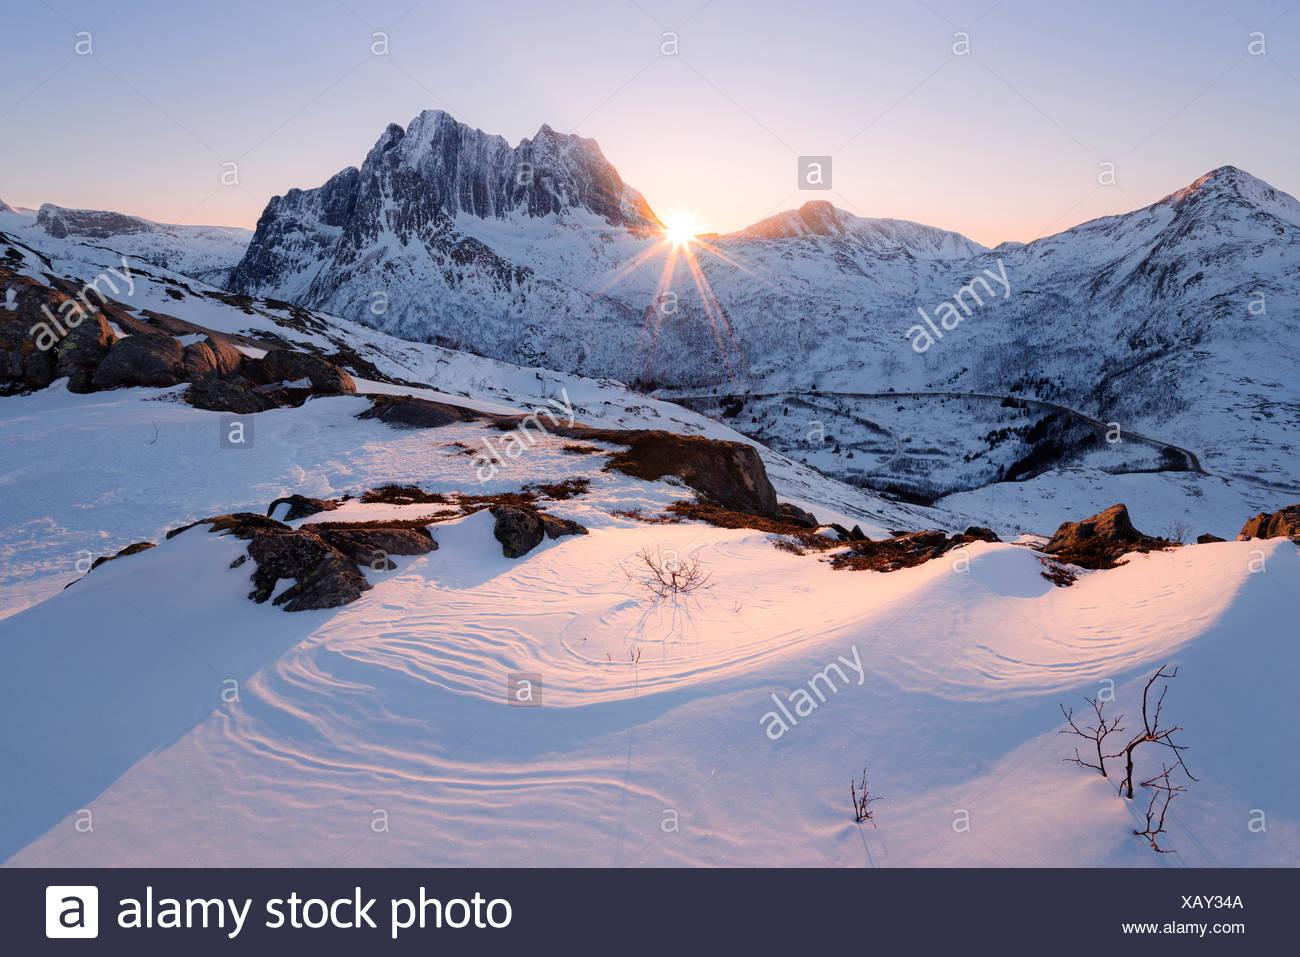 Norway, Nordland, Senja, island, mountain, back light, sun, star, rays, light, curved, snow, winter, soft, bizarre, summit, scenery - Stock Image